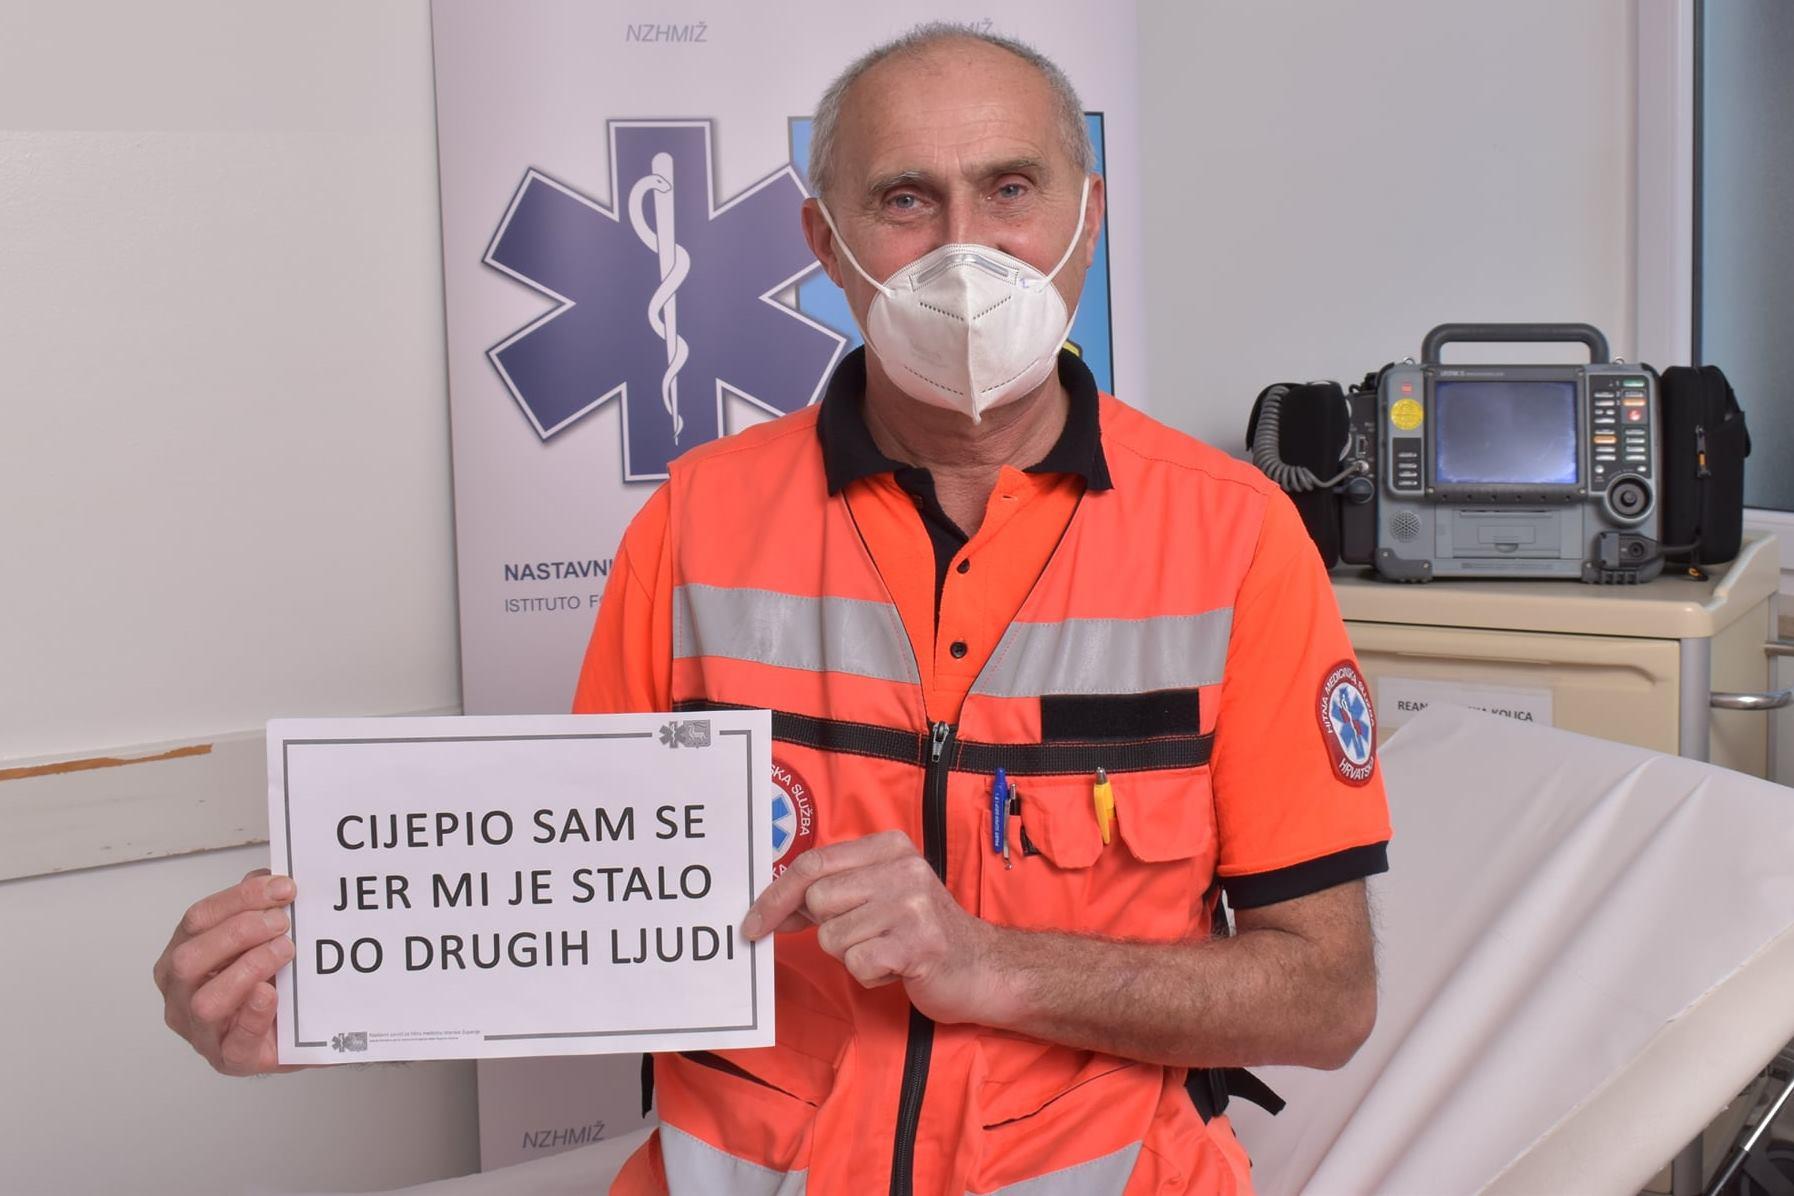 http://www.novigrad.hr/meu_prvim_cijepljenima_protiv_covida_i_novigraanin_zoran_sari